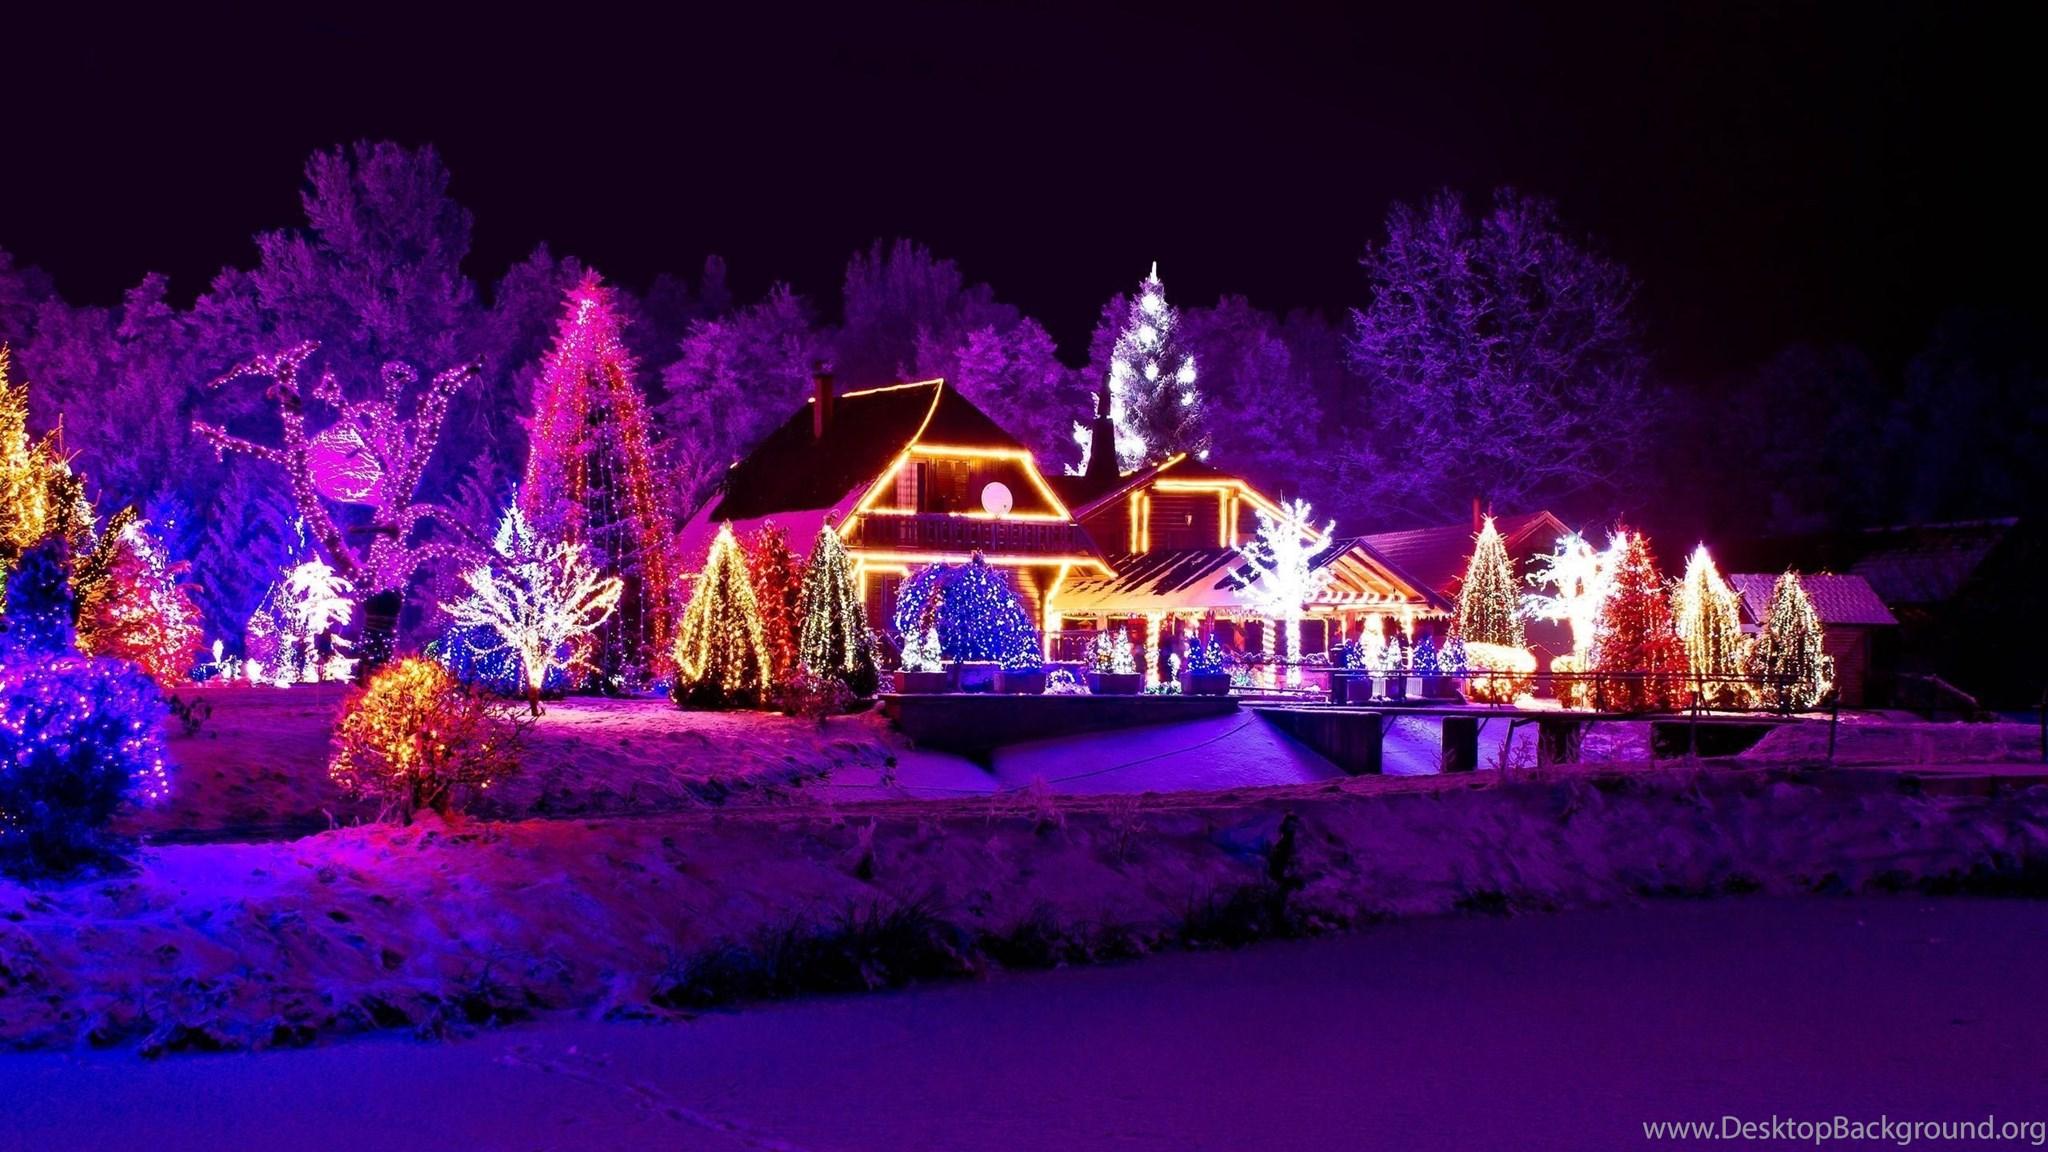 Beautiful Christmas Night City Lights Wallpaper.jpg